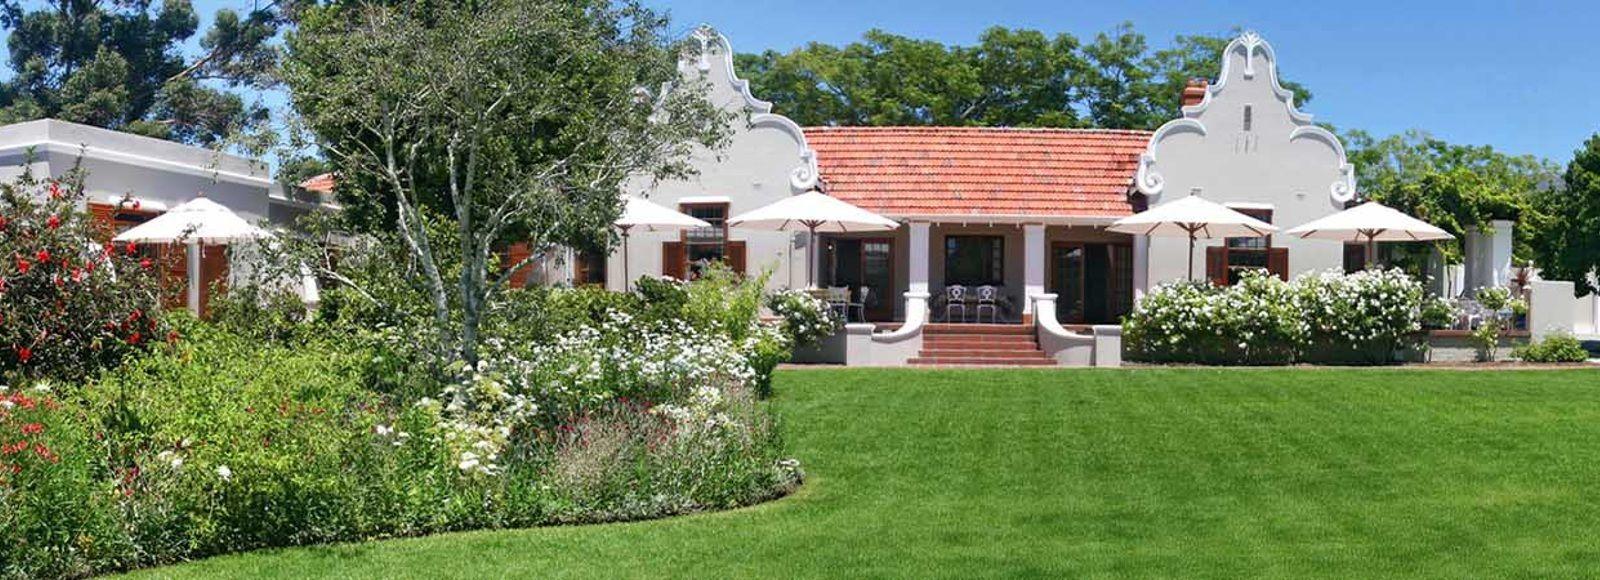 Hotel Glen Avon Lodge South Africa